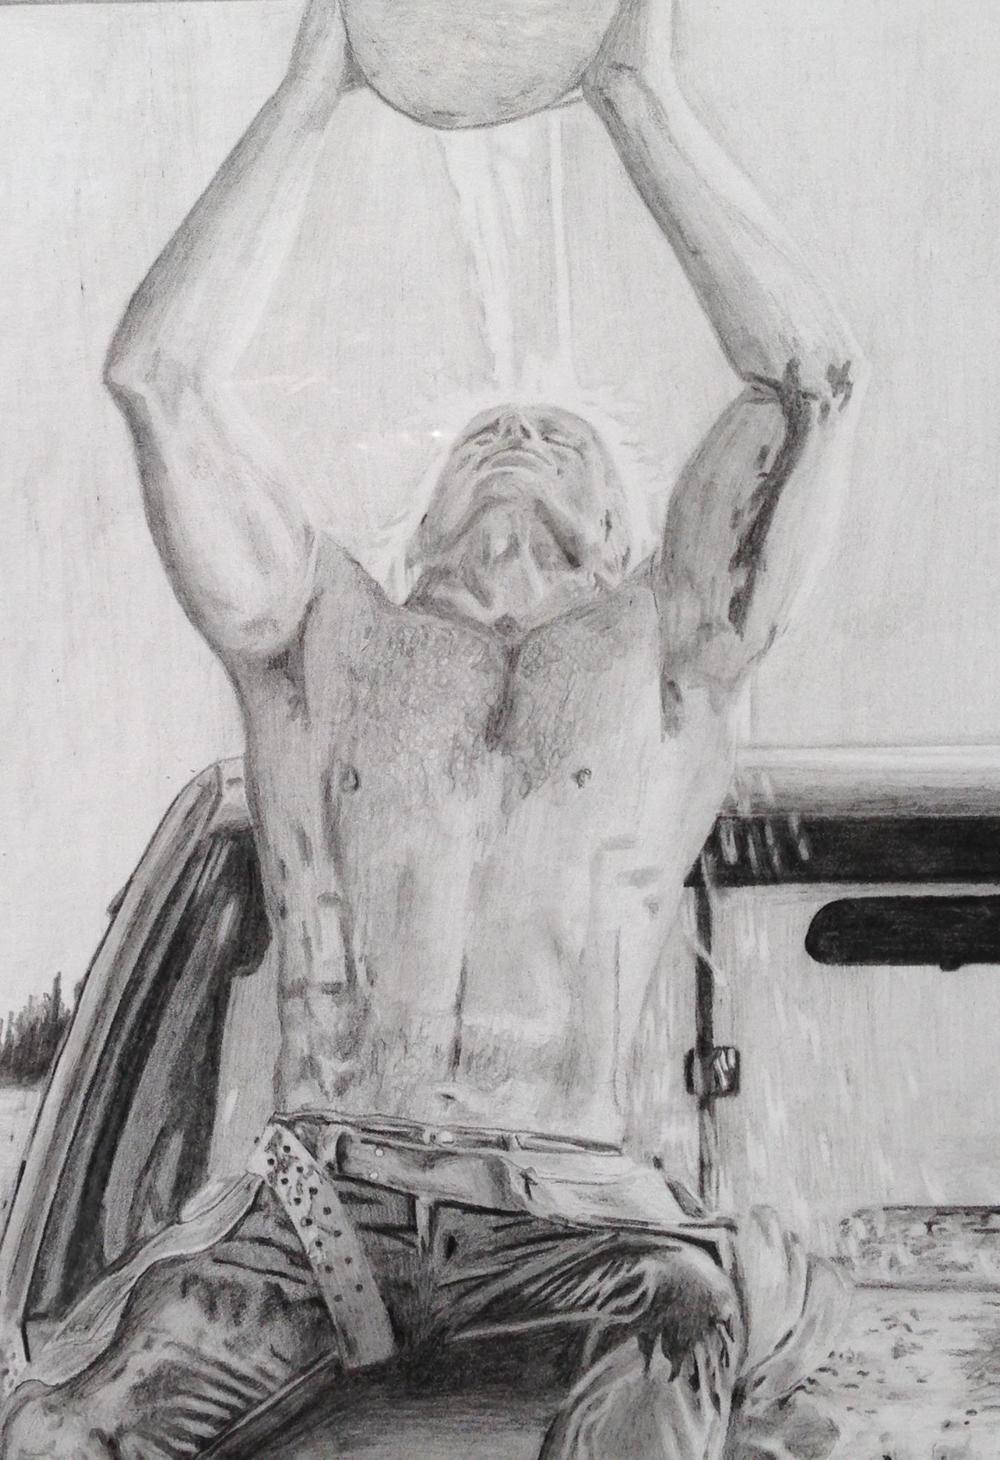 Chevy Man